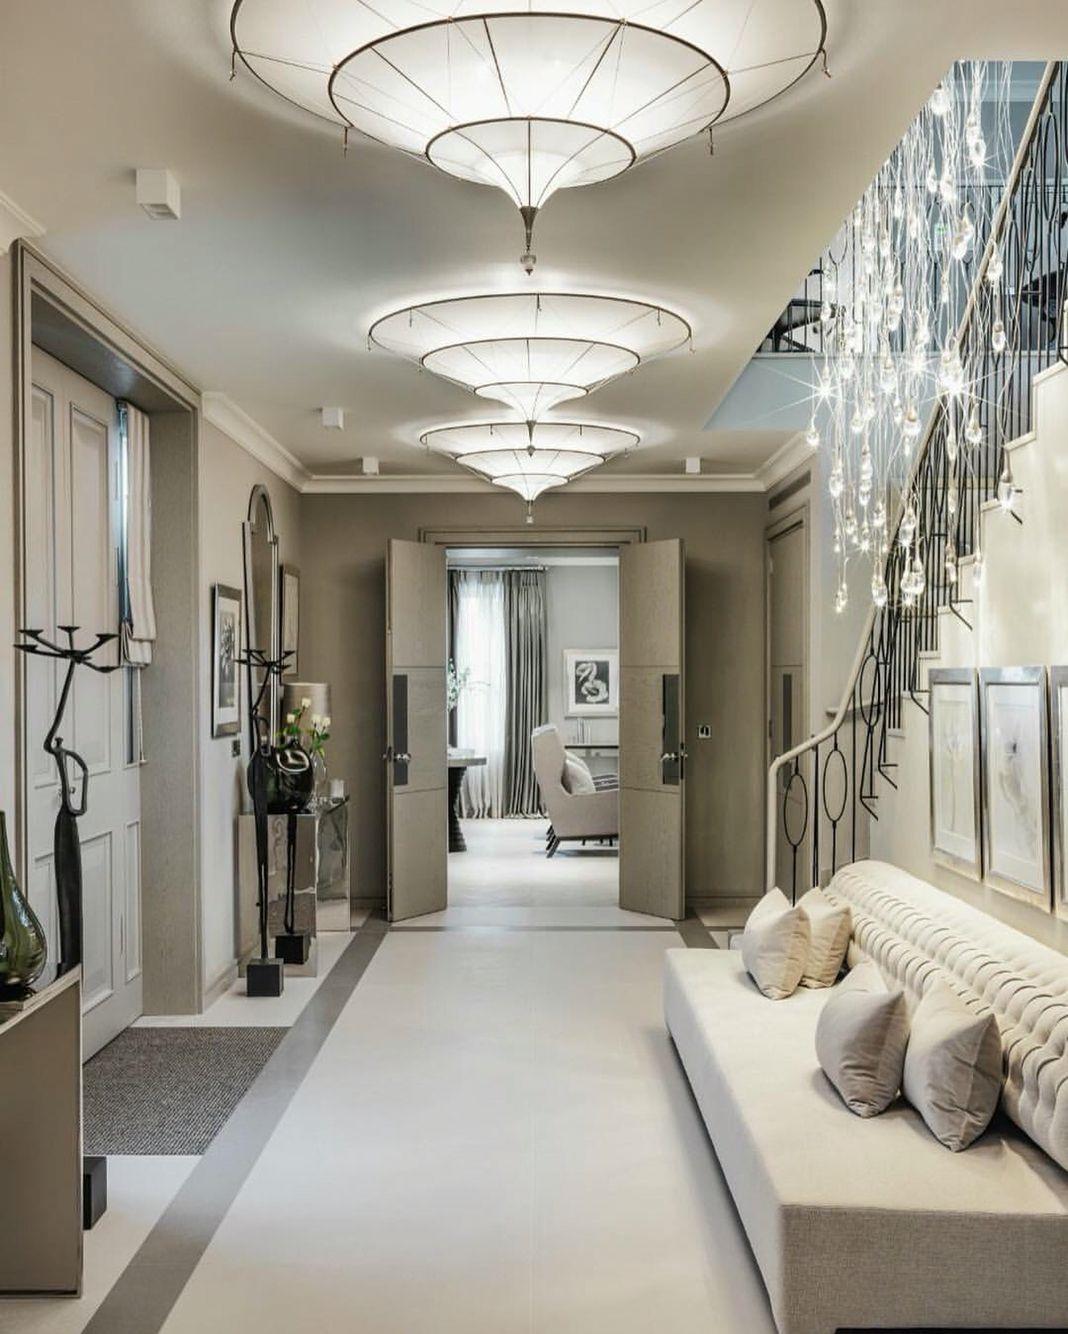 Grey Hallway Kelly Hoppen With Images Kelly Hoppen Interiors